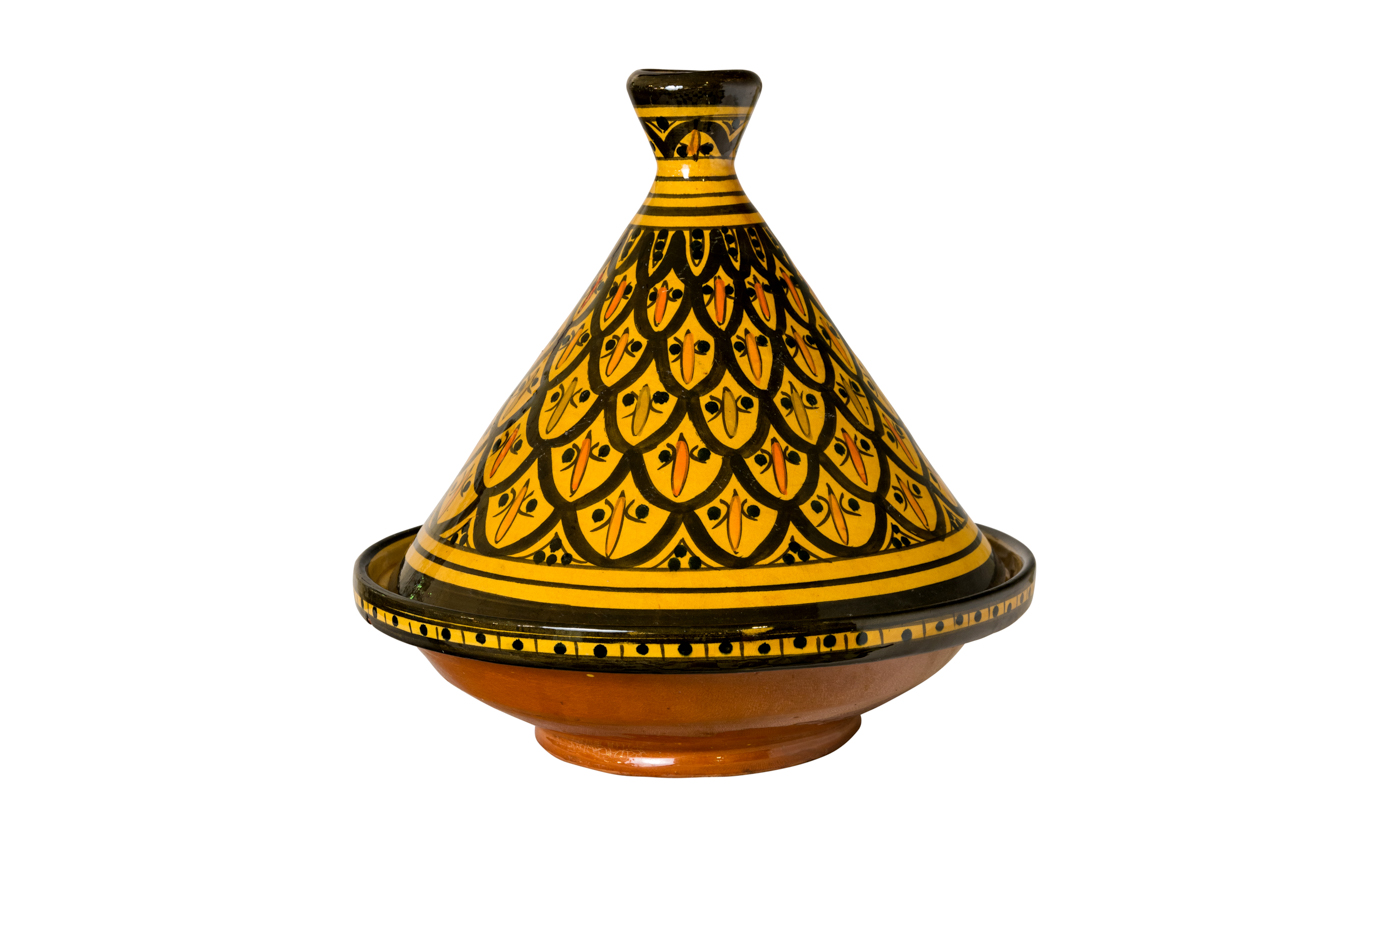 Tajín Marruecos Mediano Amarillo